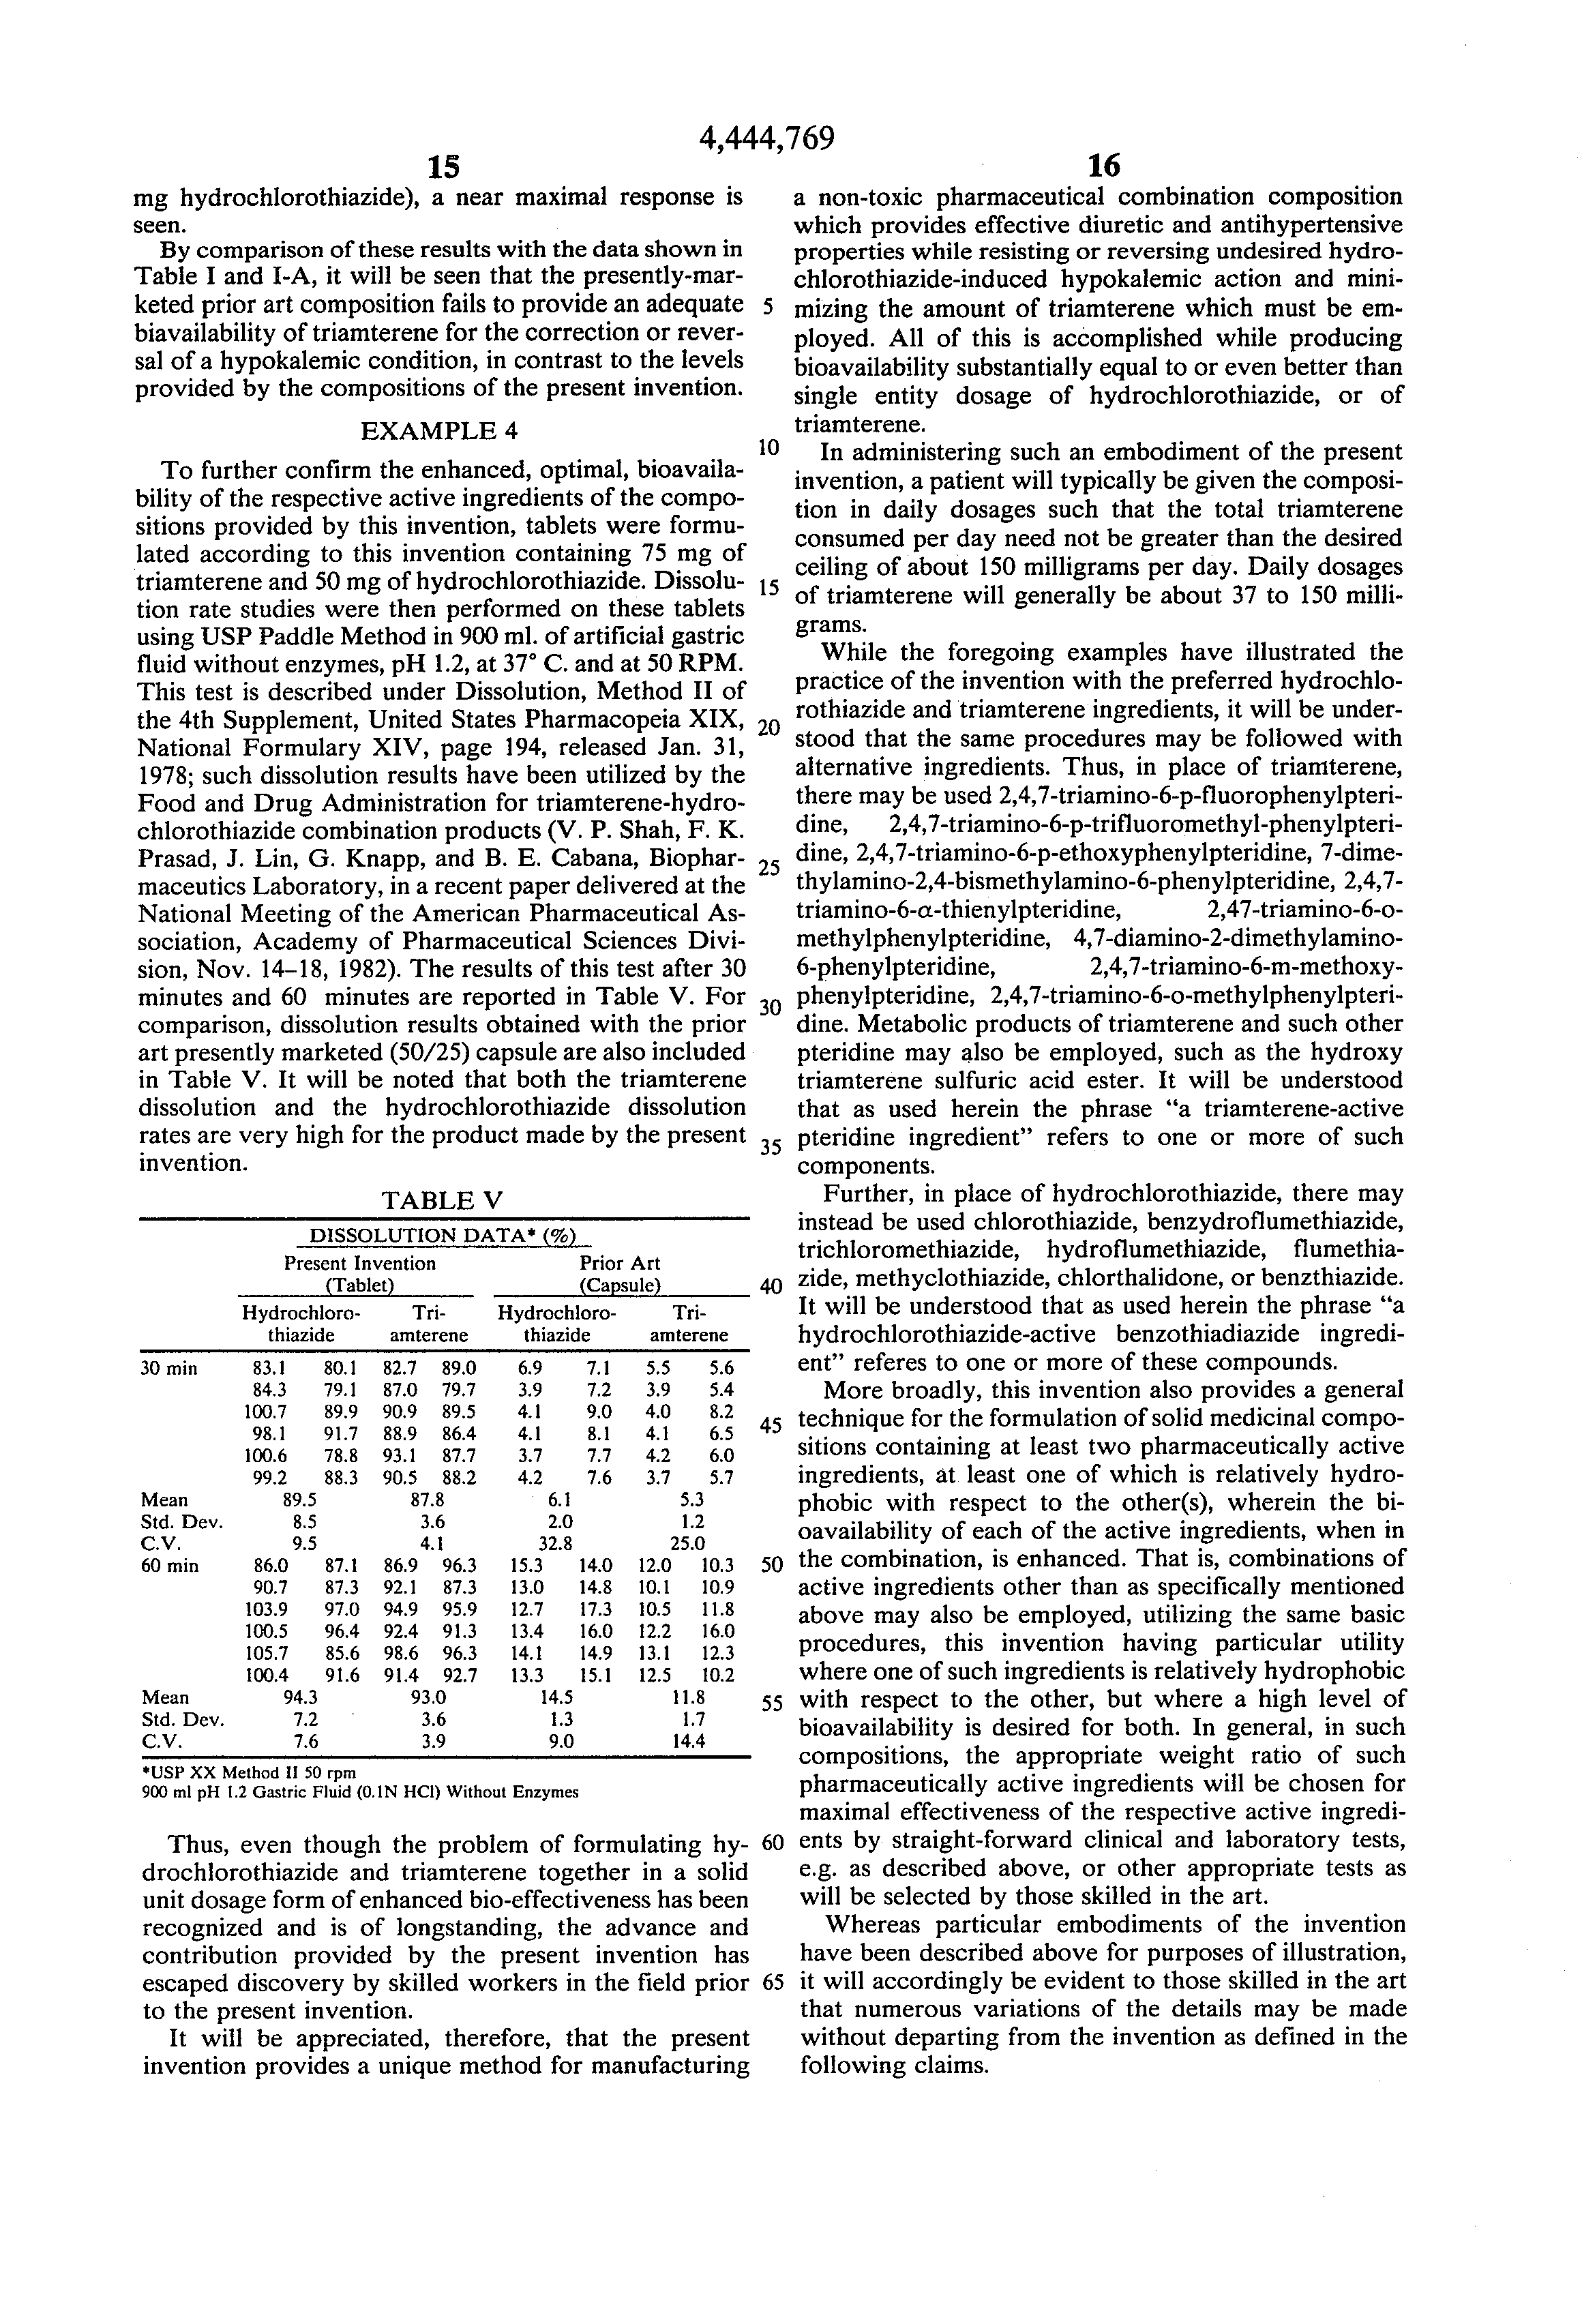 cephalexin 500mg dosage